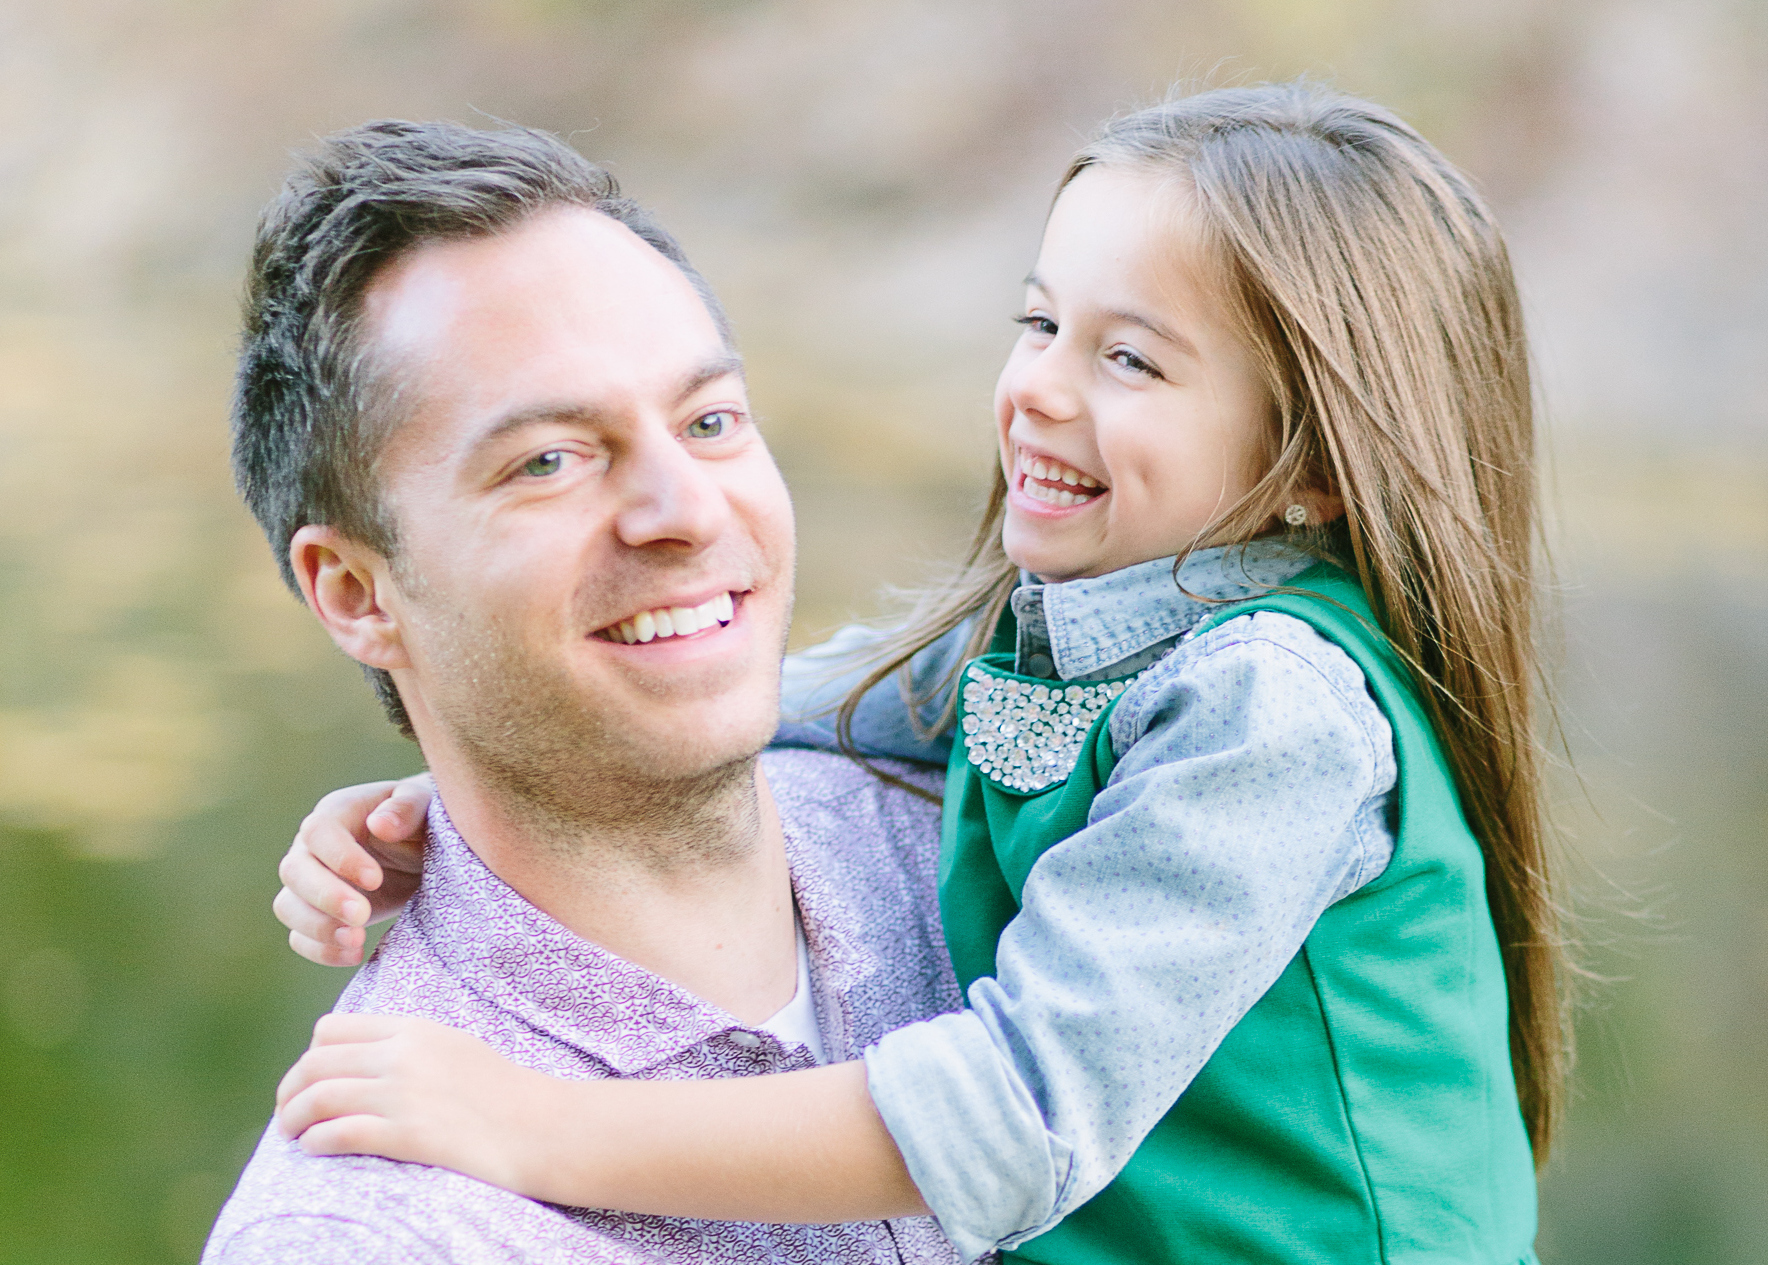 Dad & Daughter 3